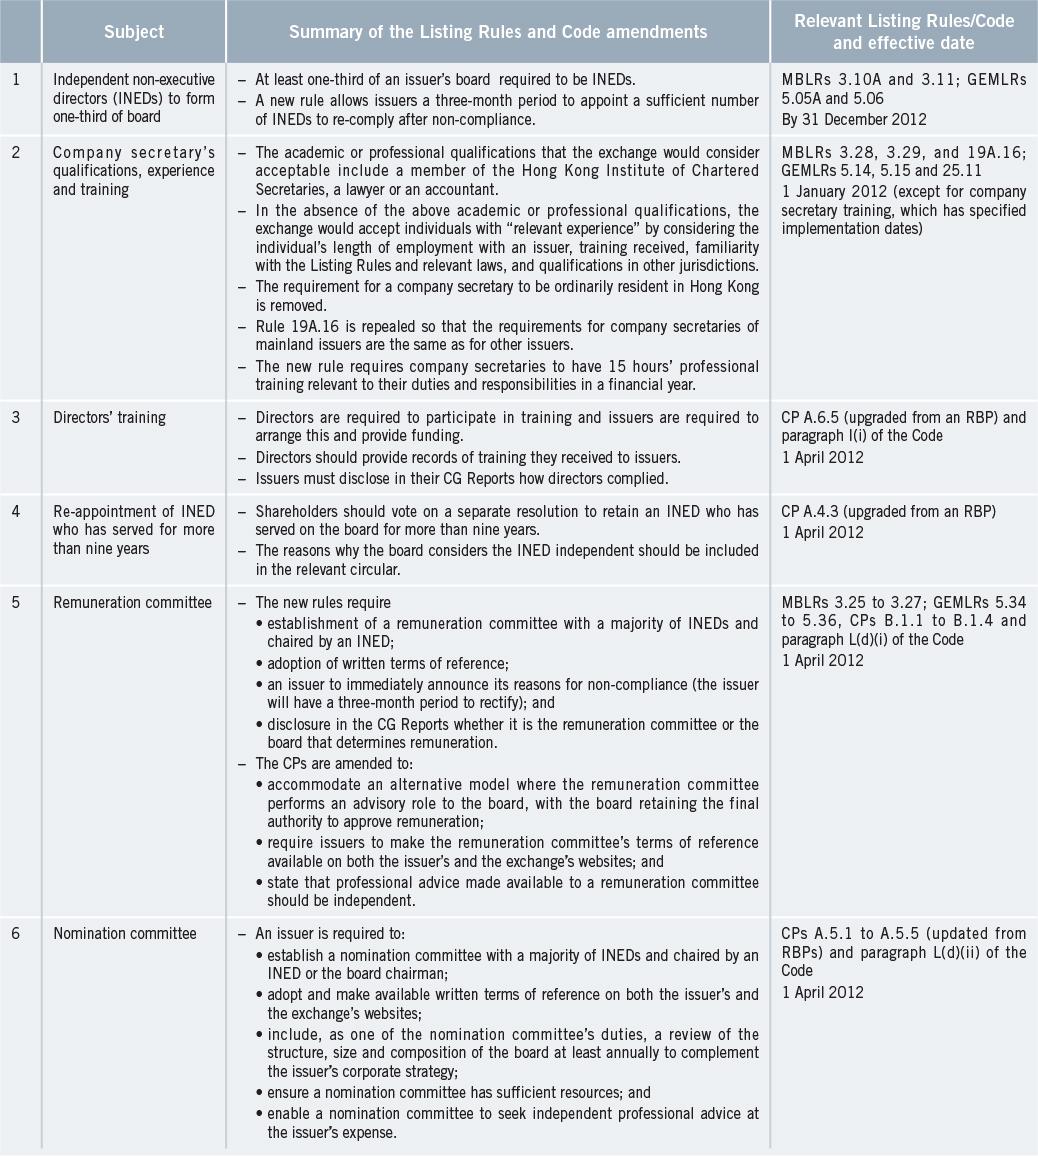 hk-exchange-listing-rules-amended-after-extensive-public-consultation-en-1